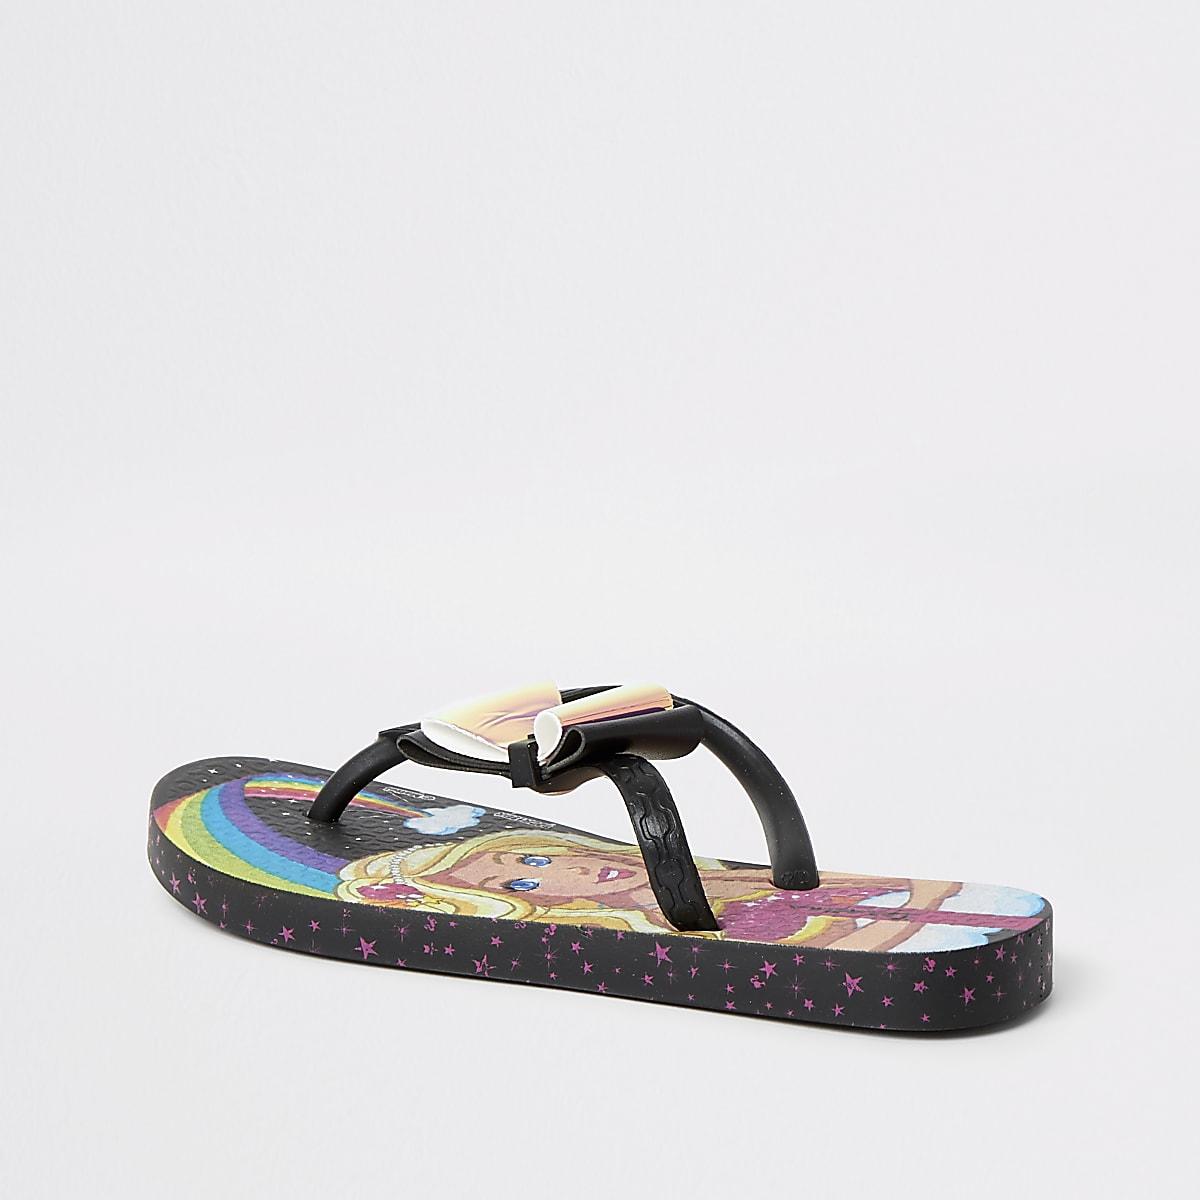 4318fdd62 Girls Ipanema Barbie Fantasia flip flops - Sandals - Footwear - girls